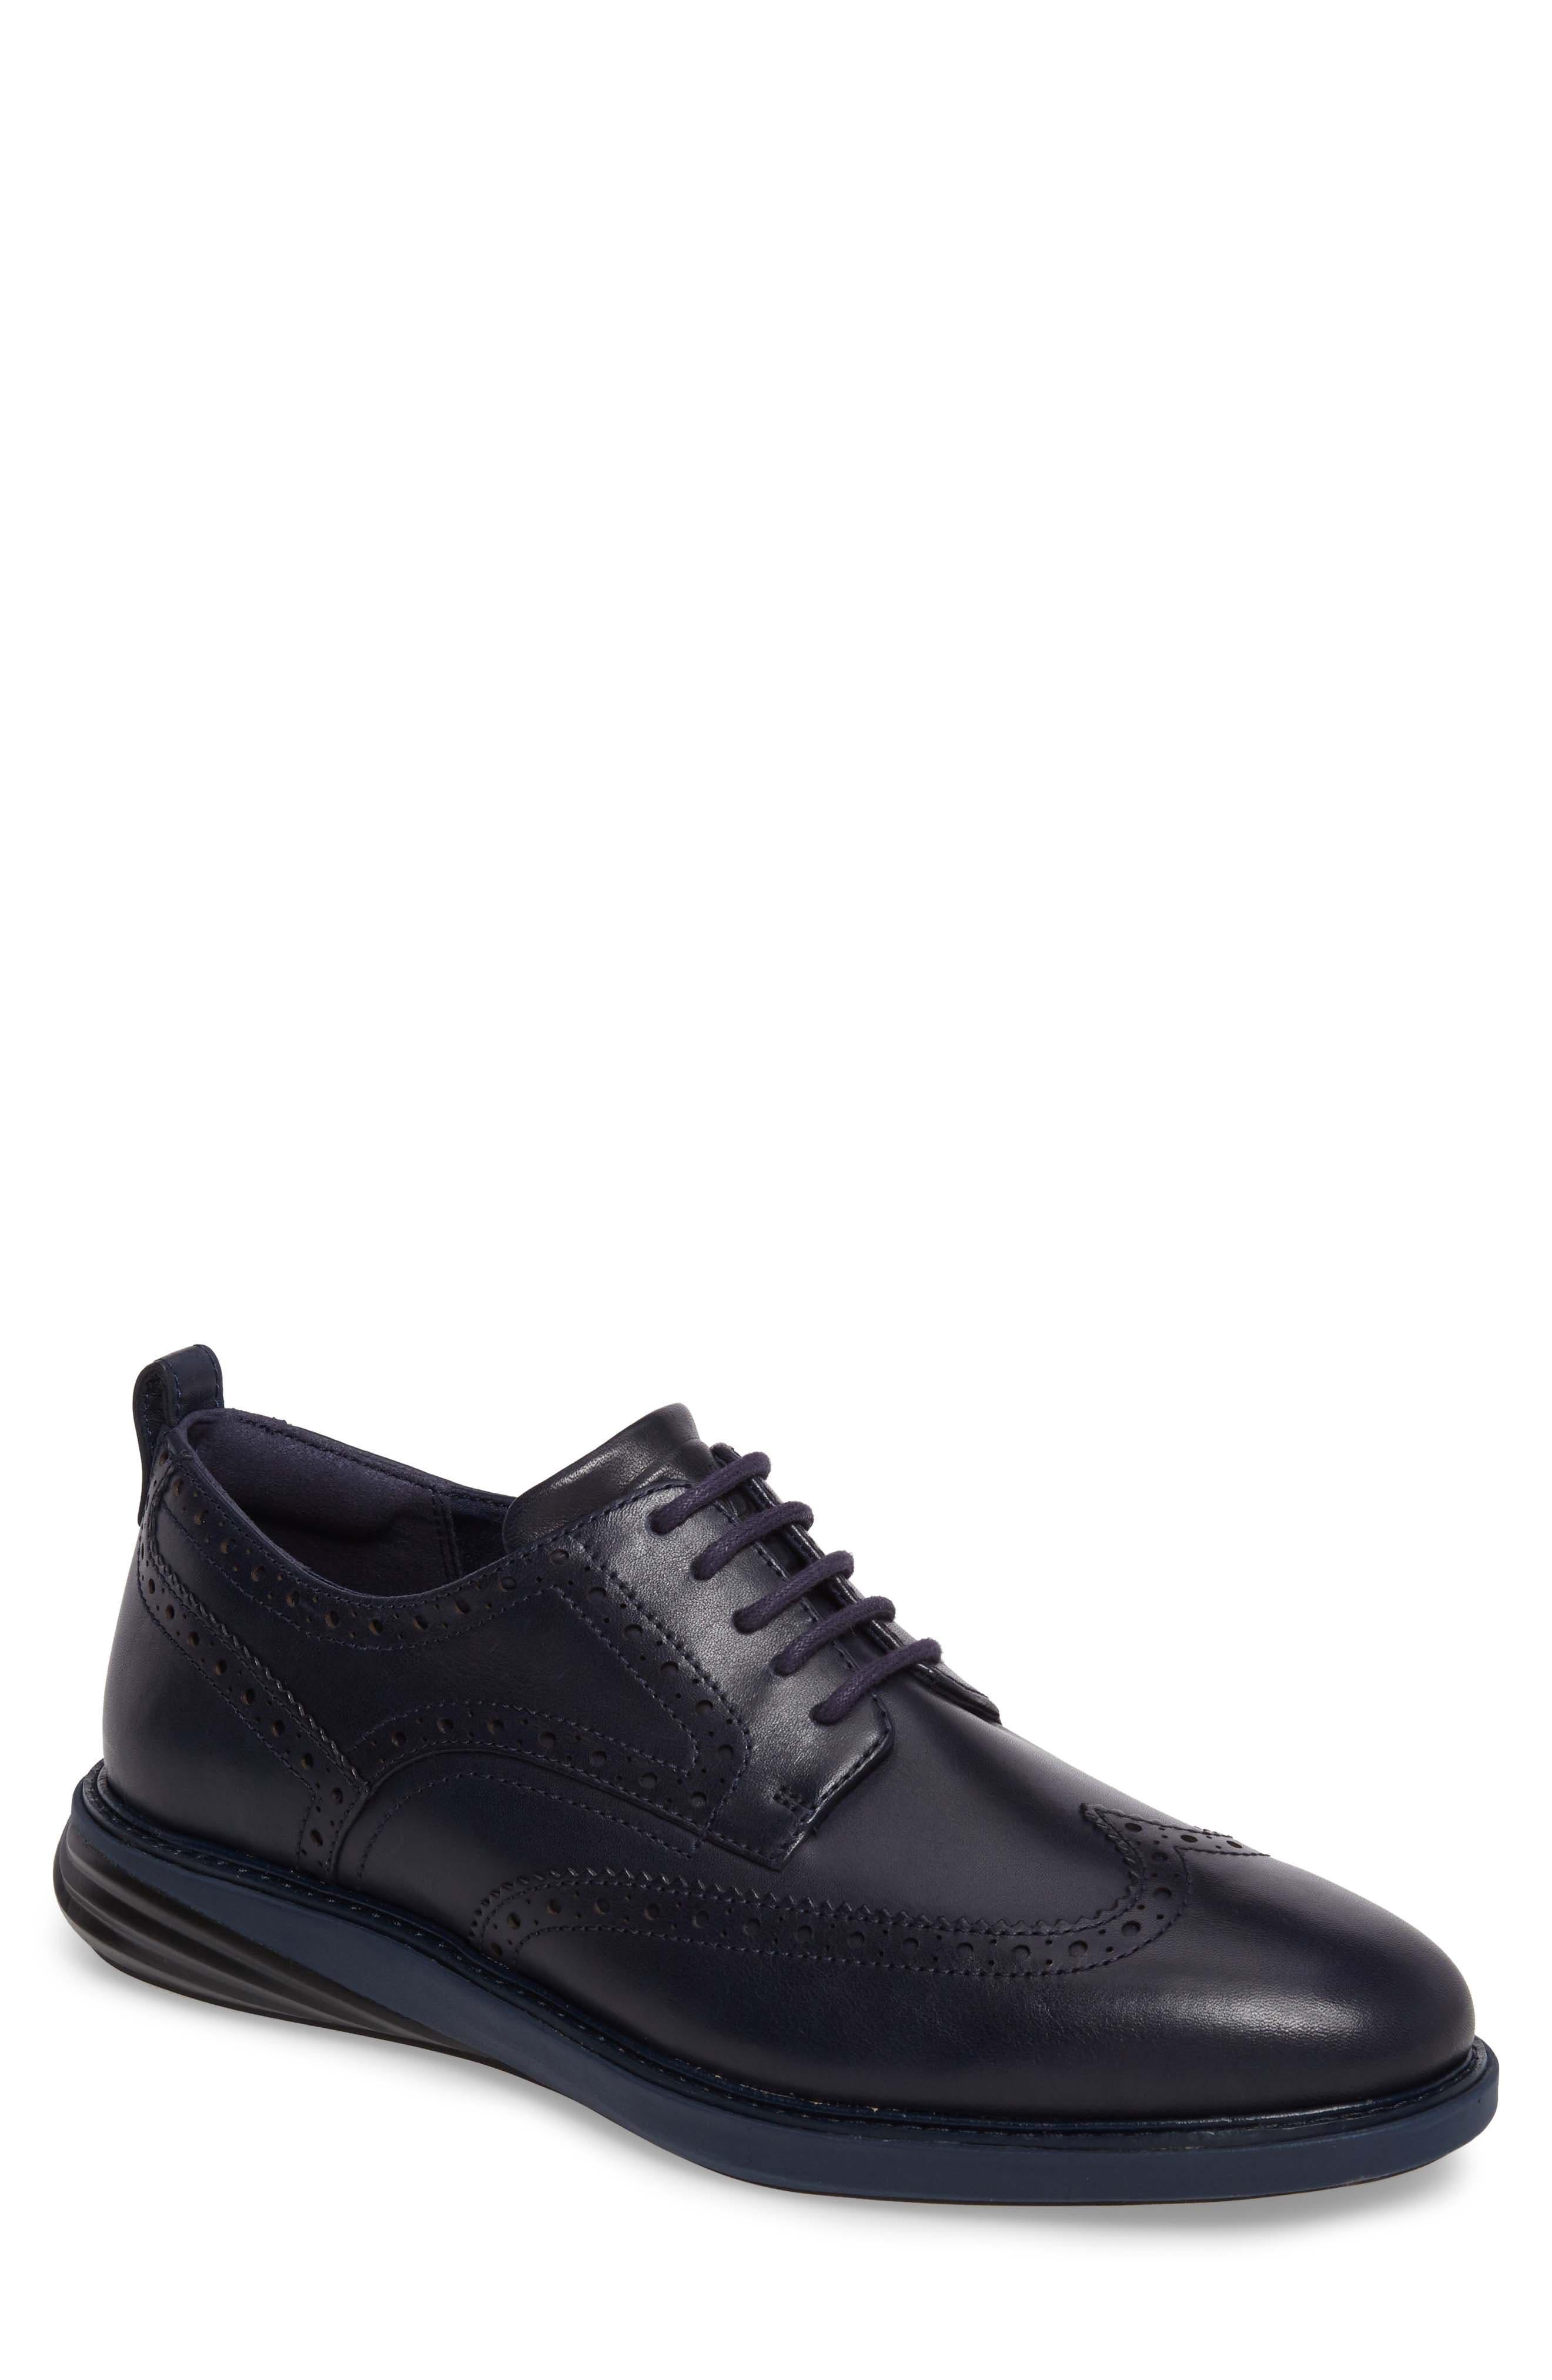 Grand Evolution Wingtip,                         Main,                         color, Marine Blue/ Black Leather